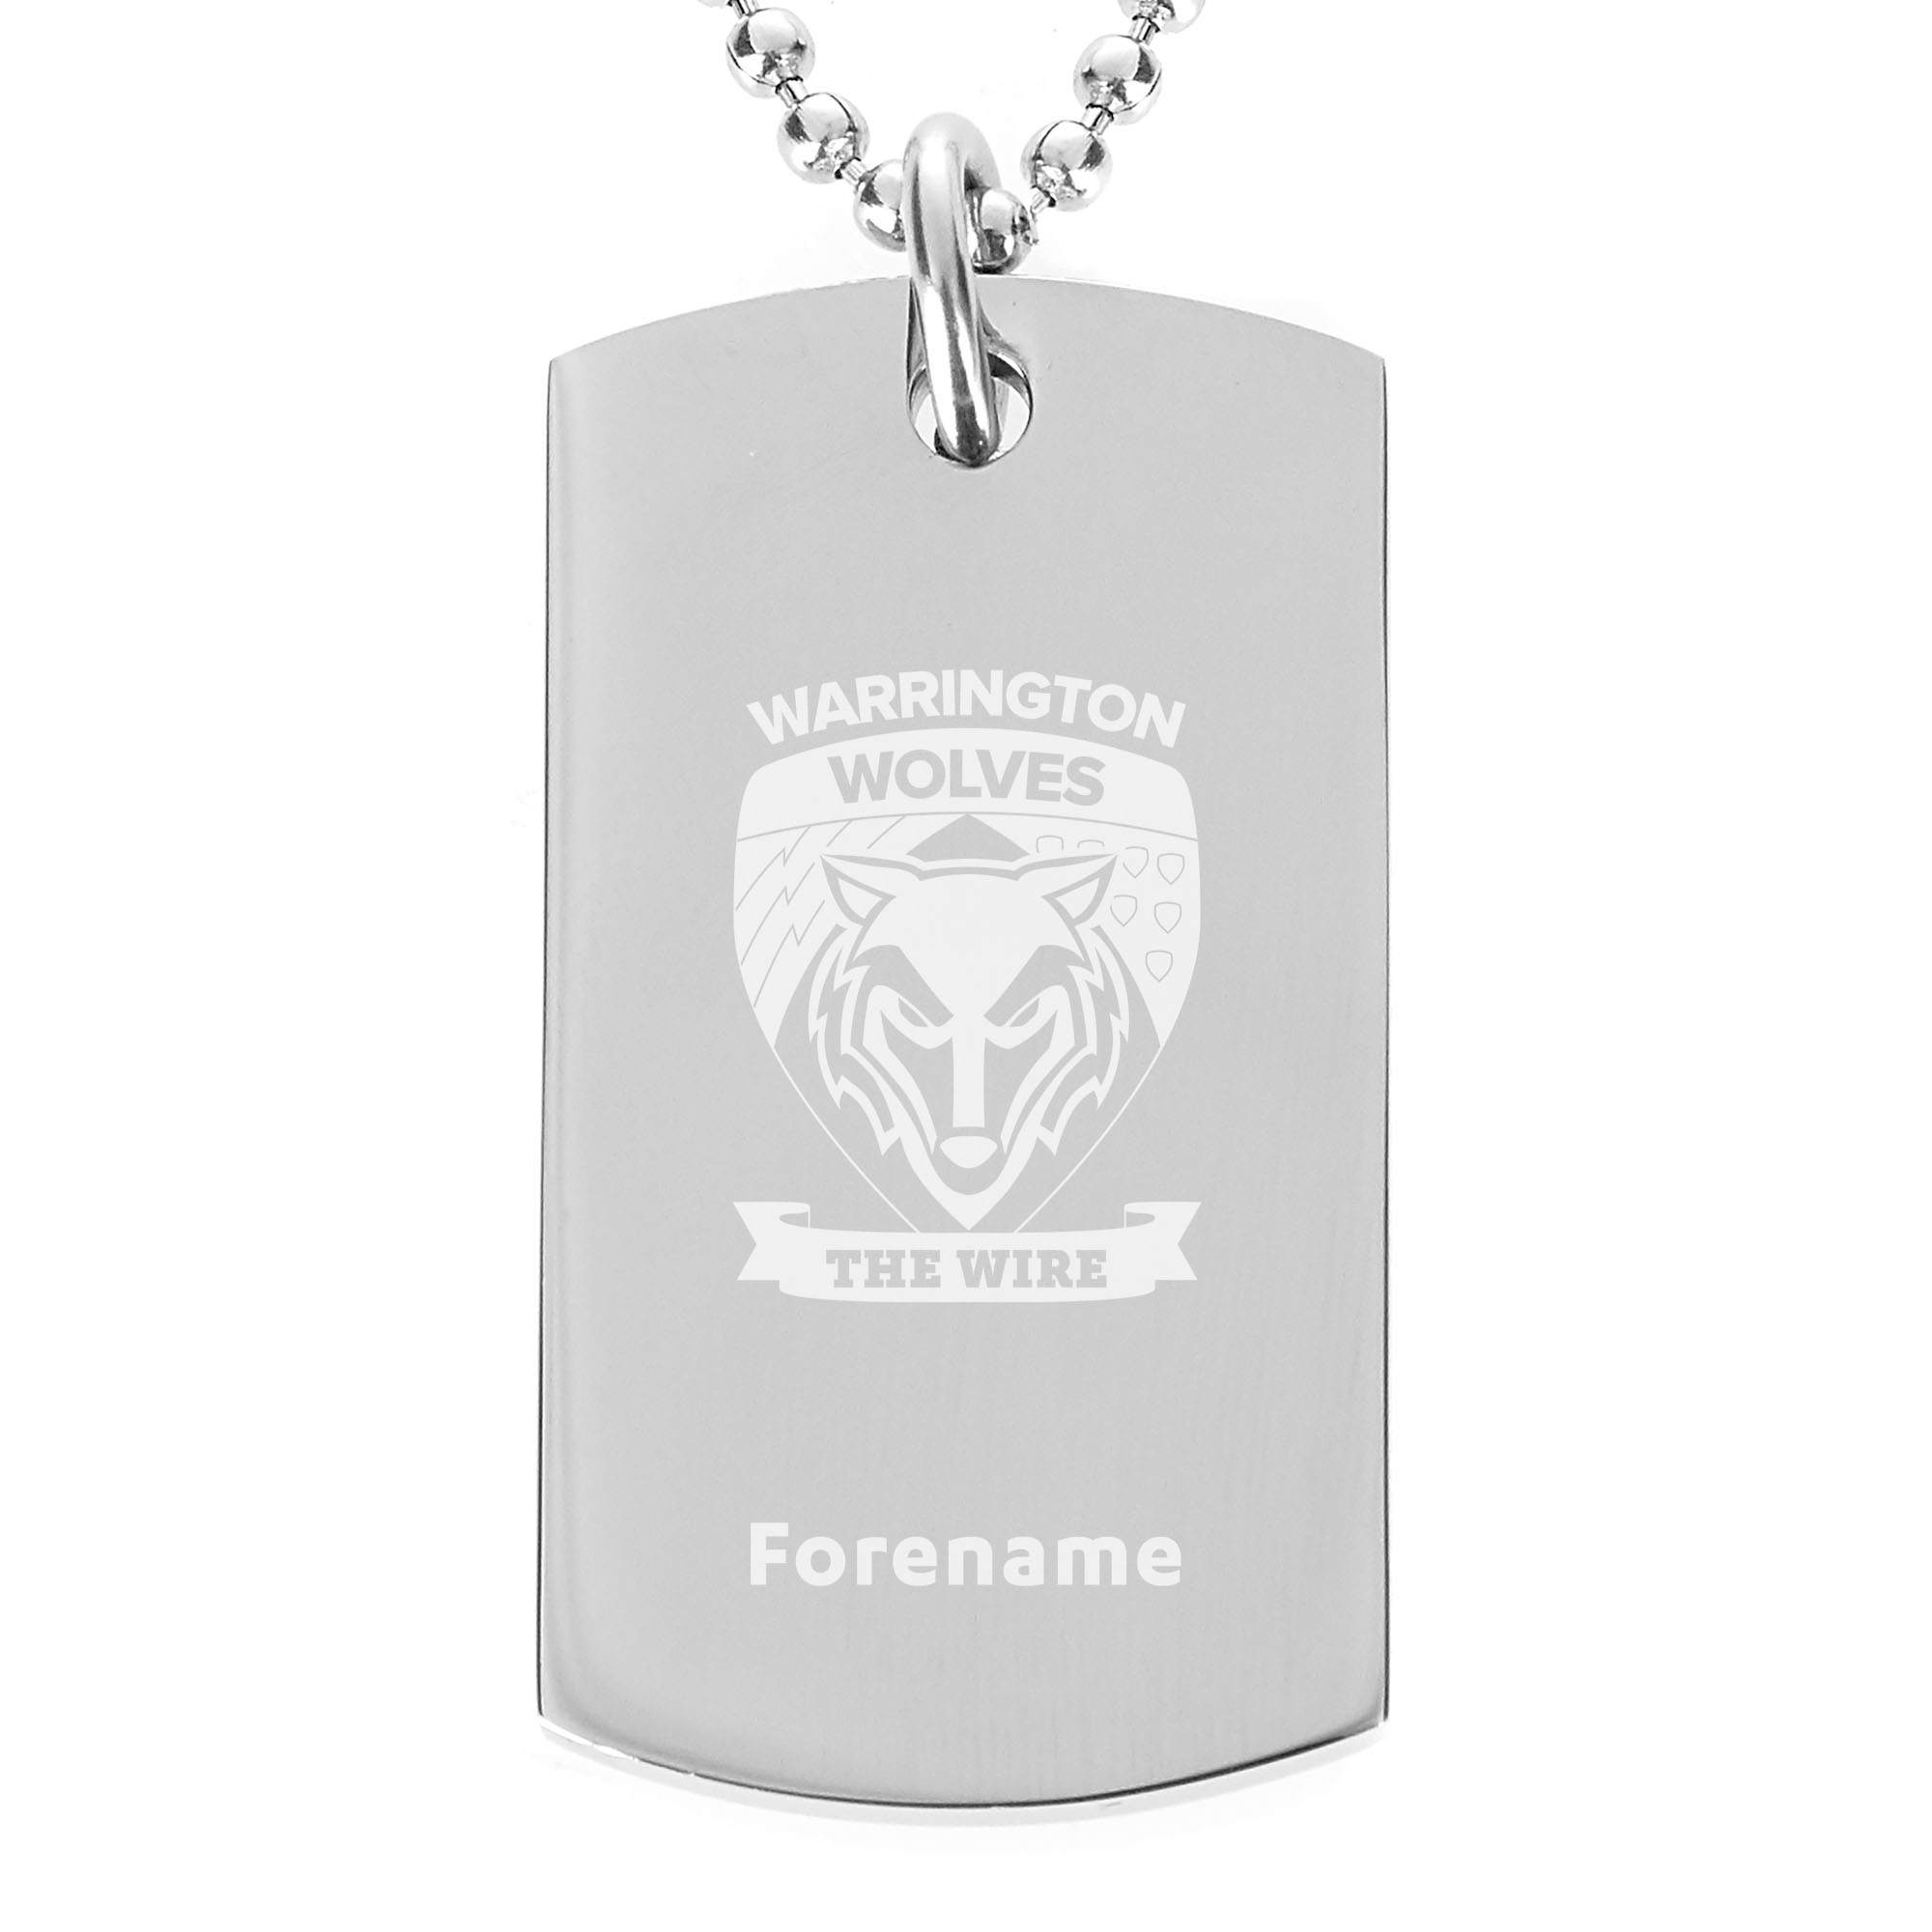 Warrington Wolves Crest Dog Tag Pendant